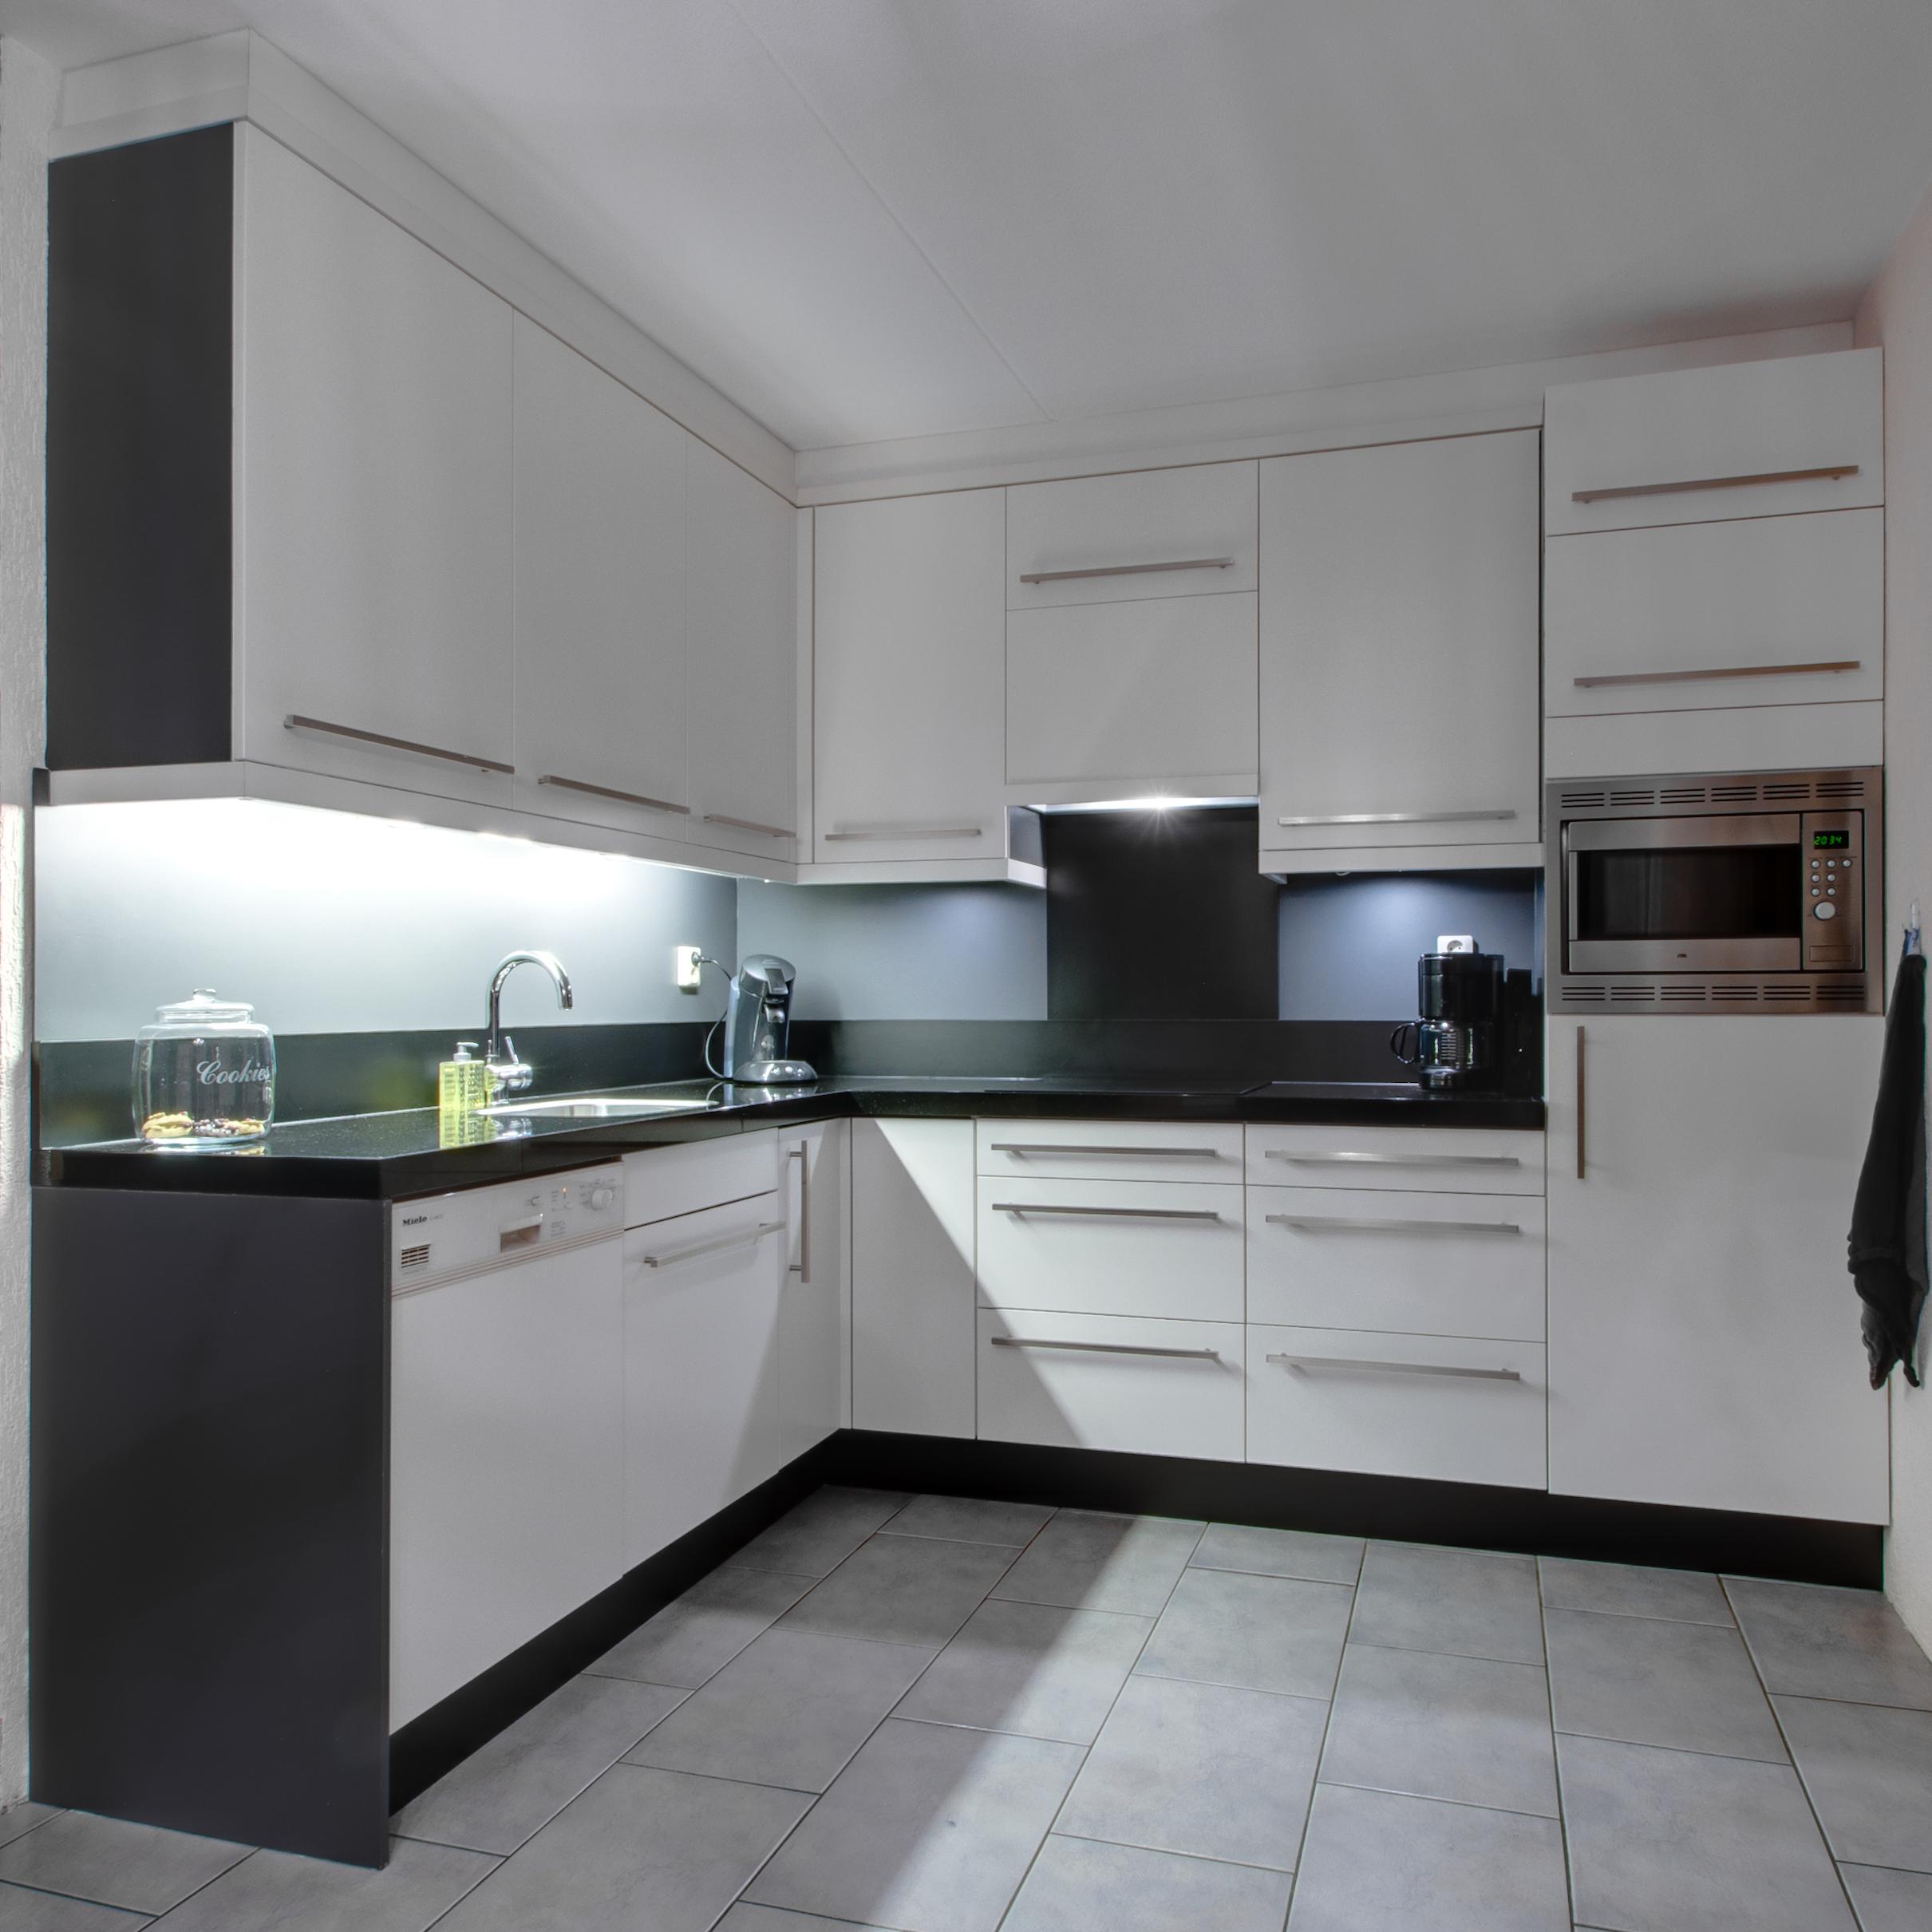 02_keuken